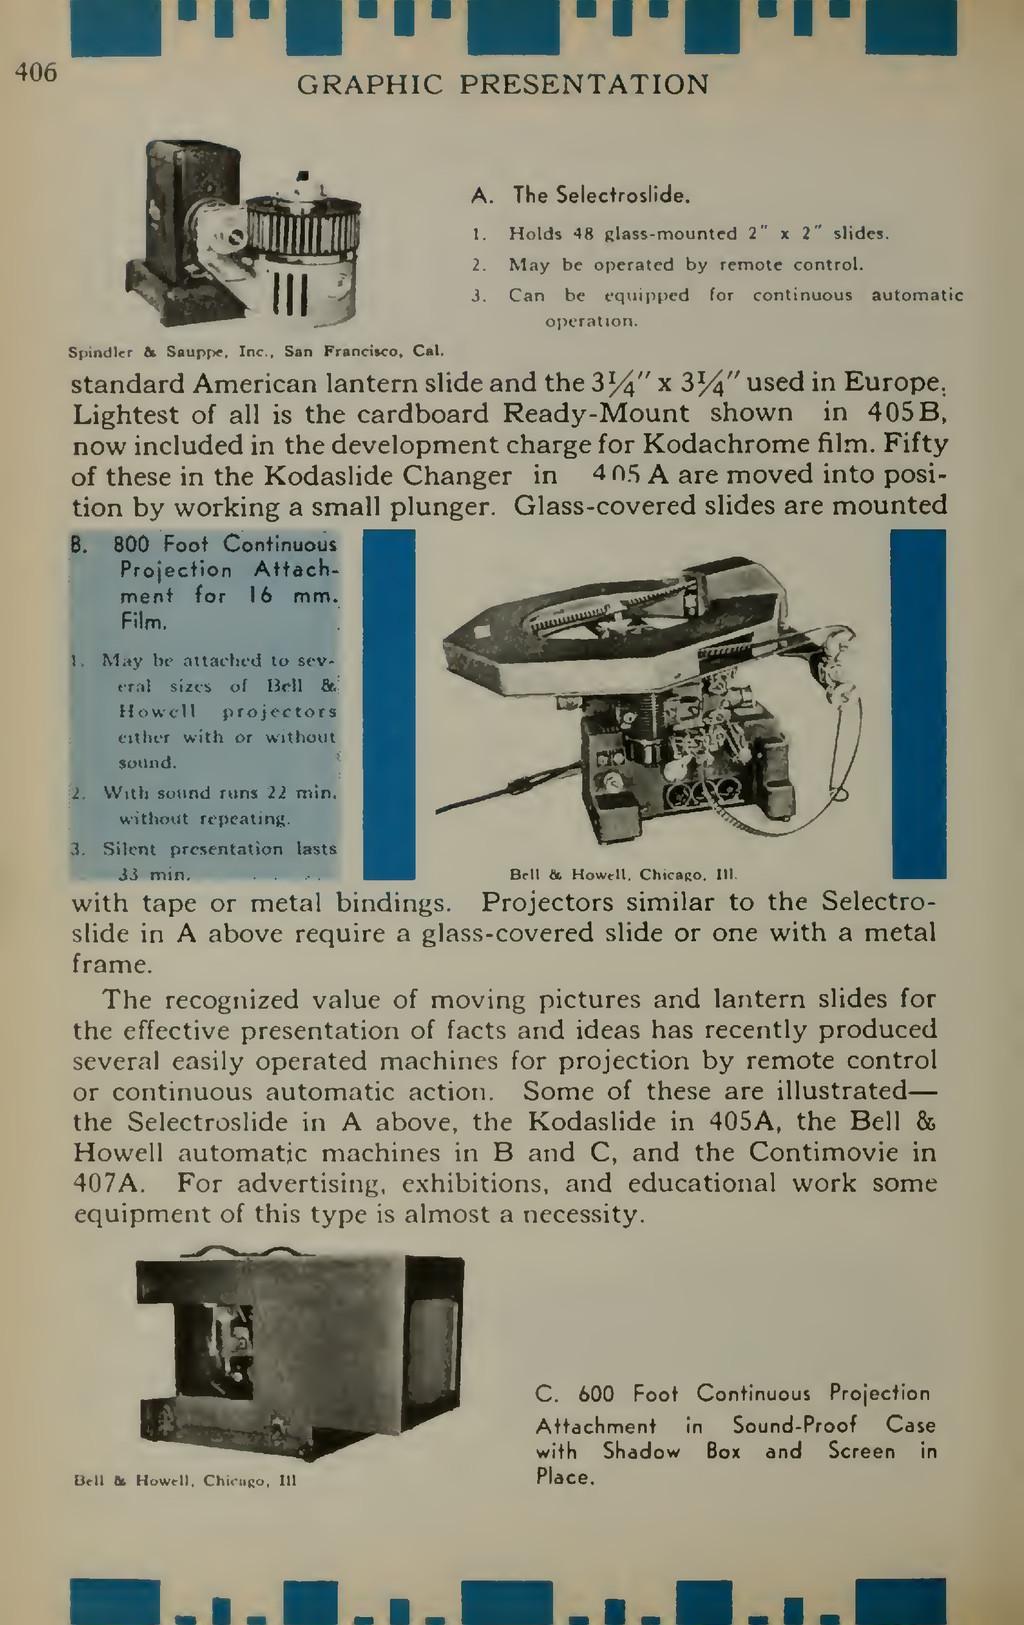 GRAPHIC PRESENTATION A. The Selectroslide. 1. H...